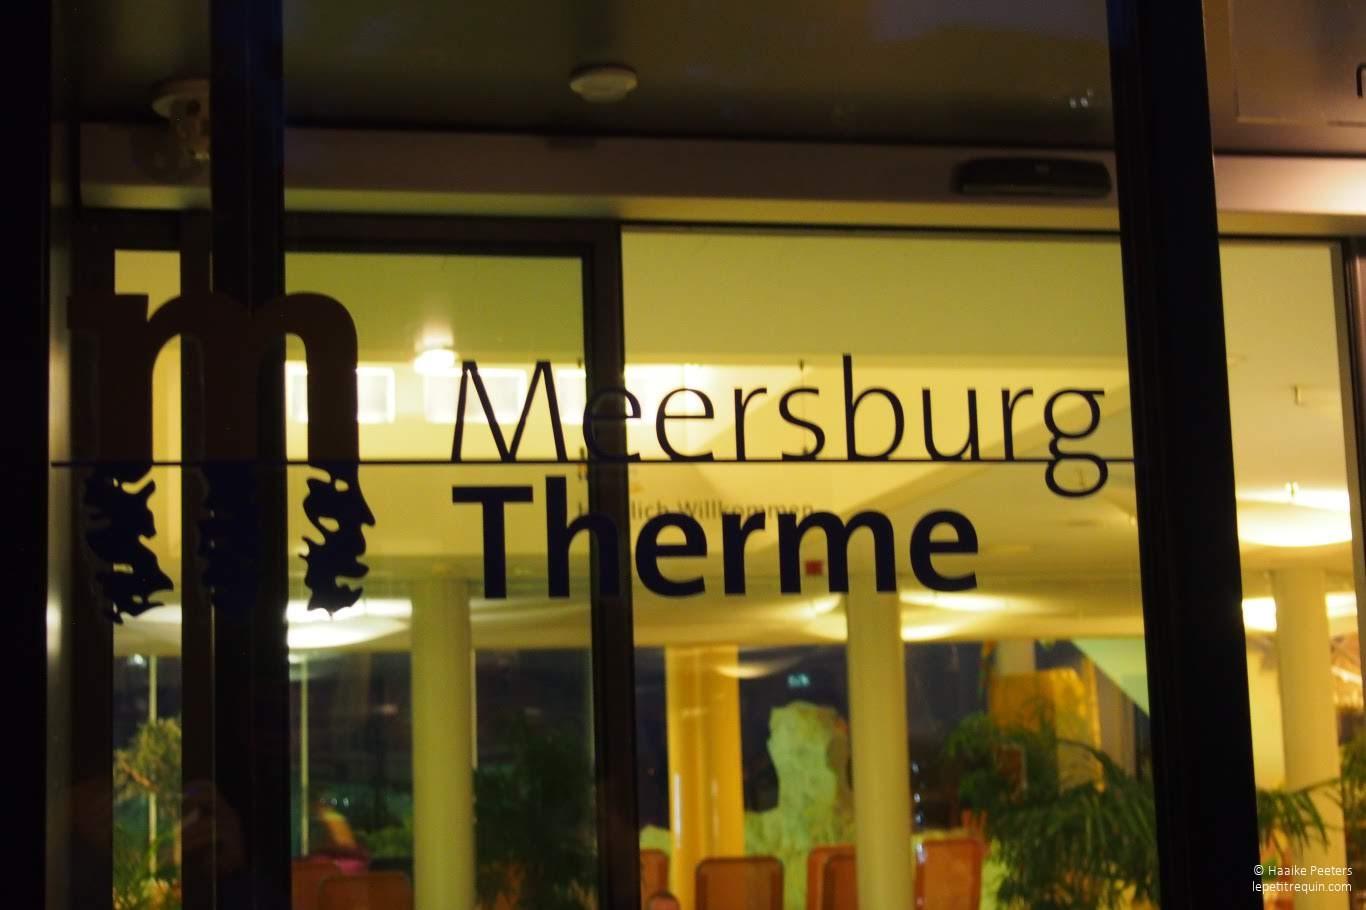 Meersburg Therme (Le petit requin)